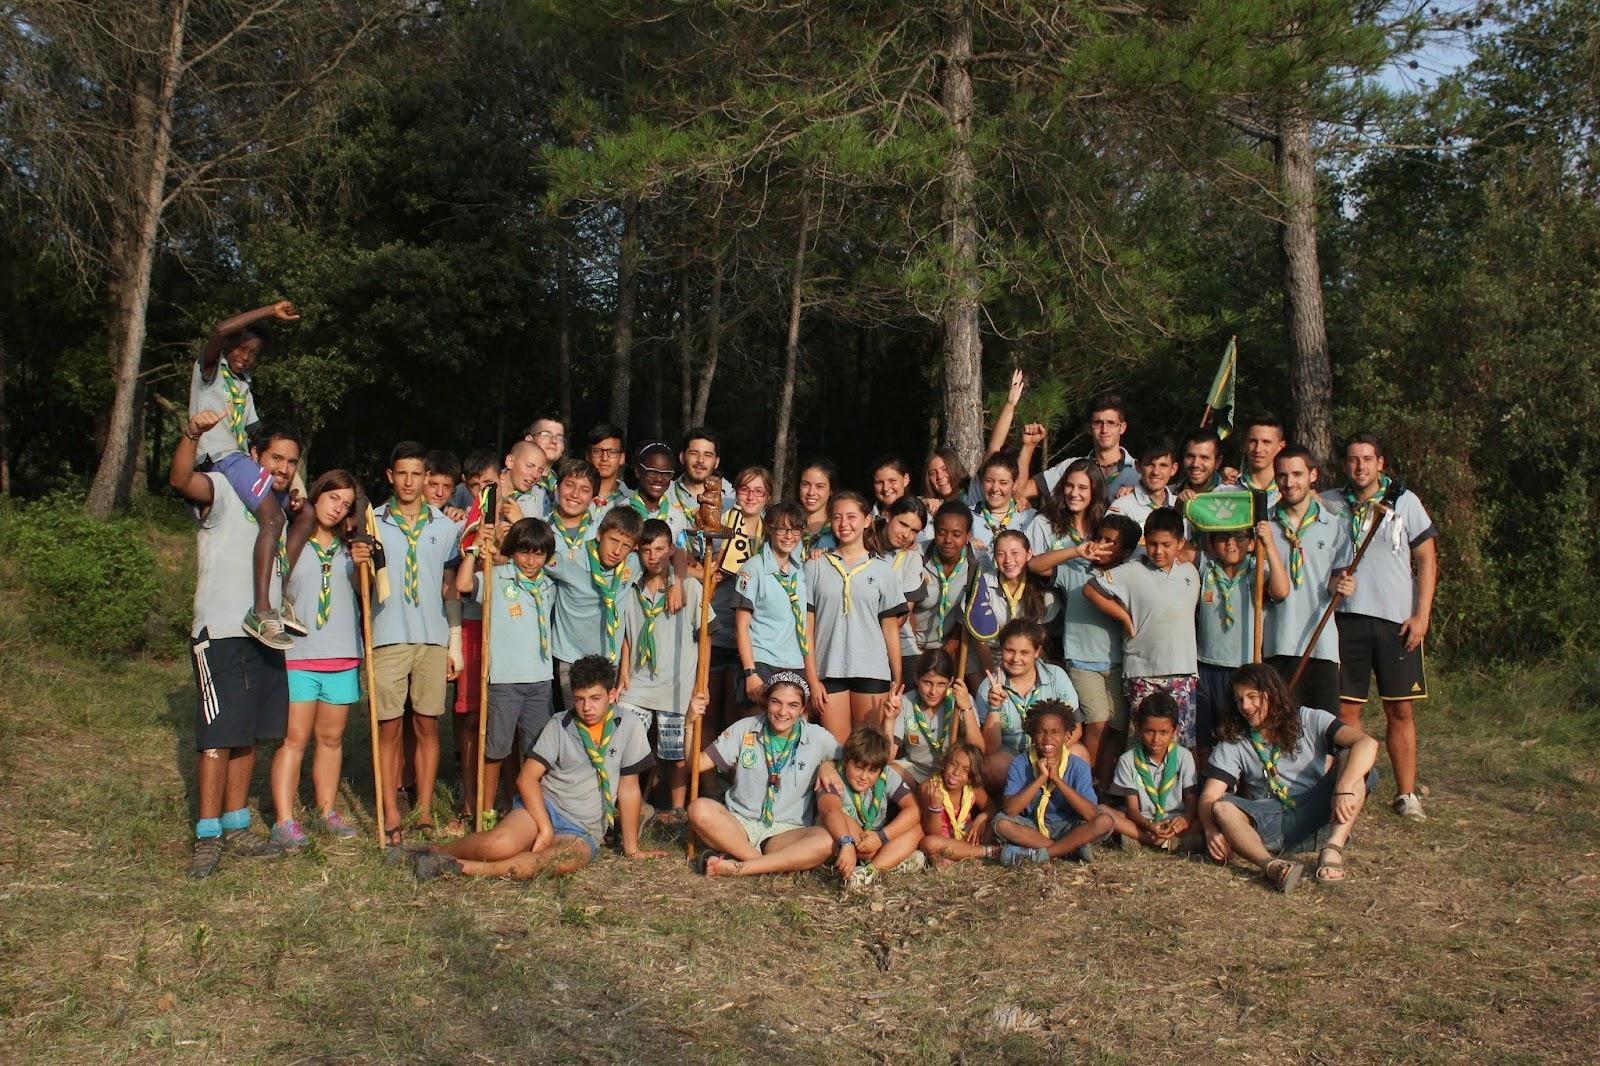 Campaments Estiu Cabanelles 2014 - IMG_0469-SMILE.jpg